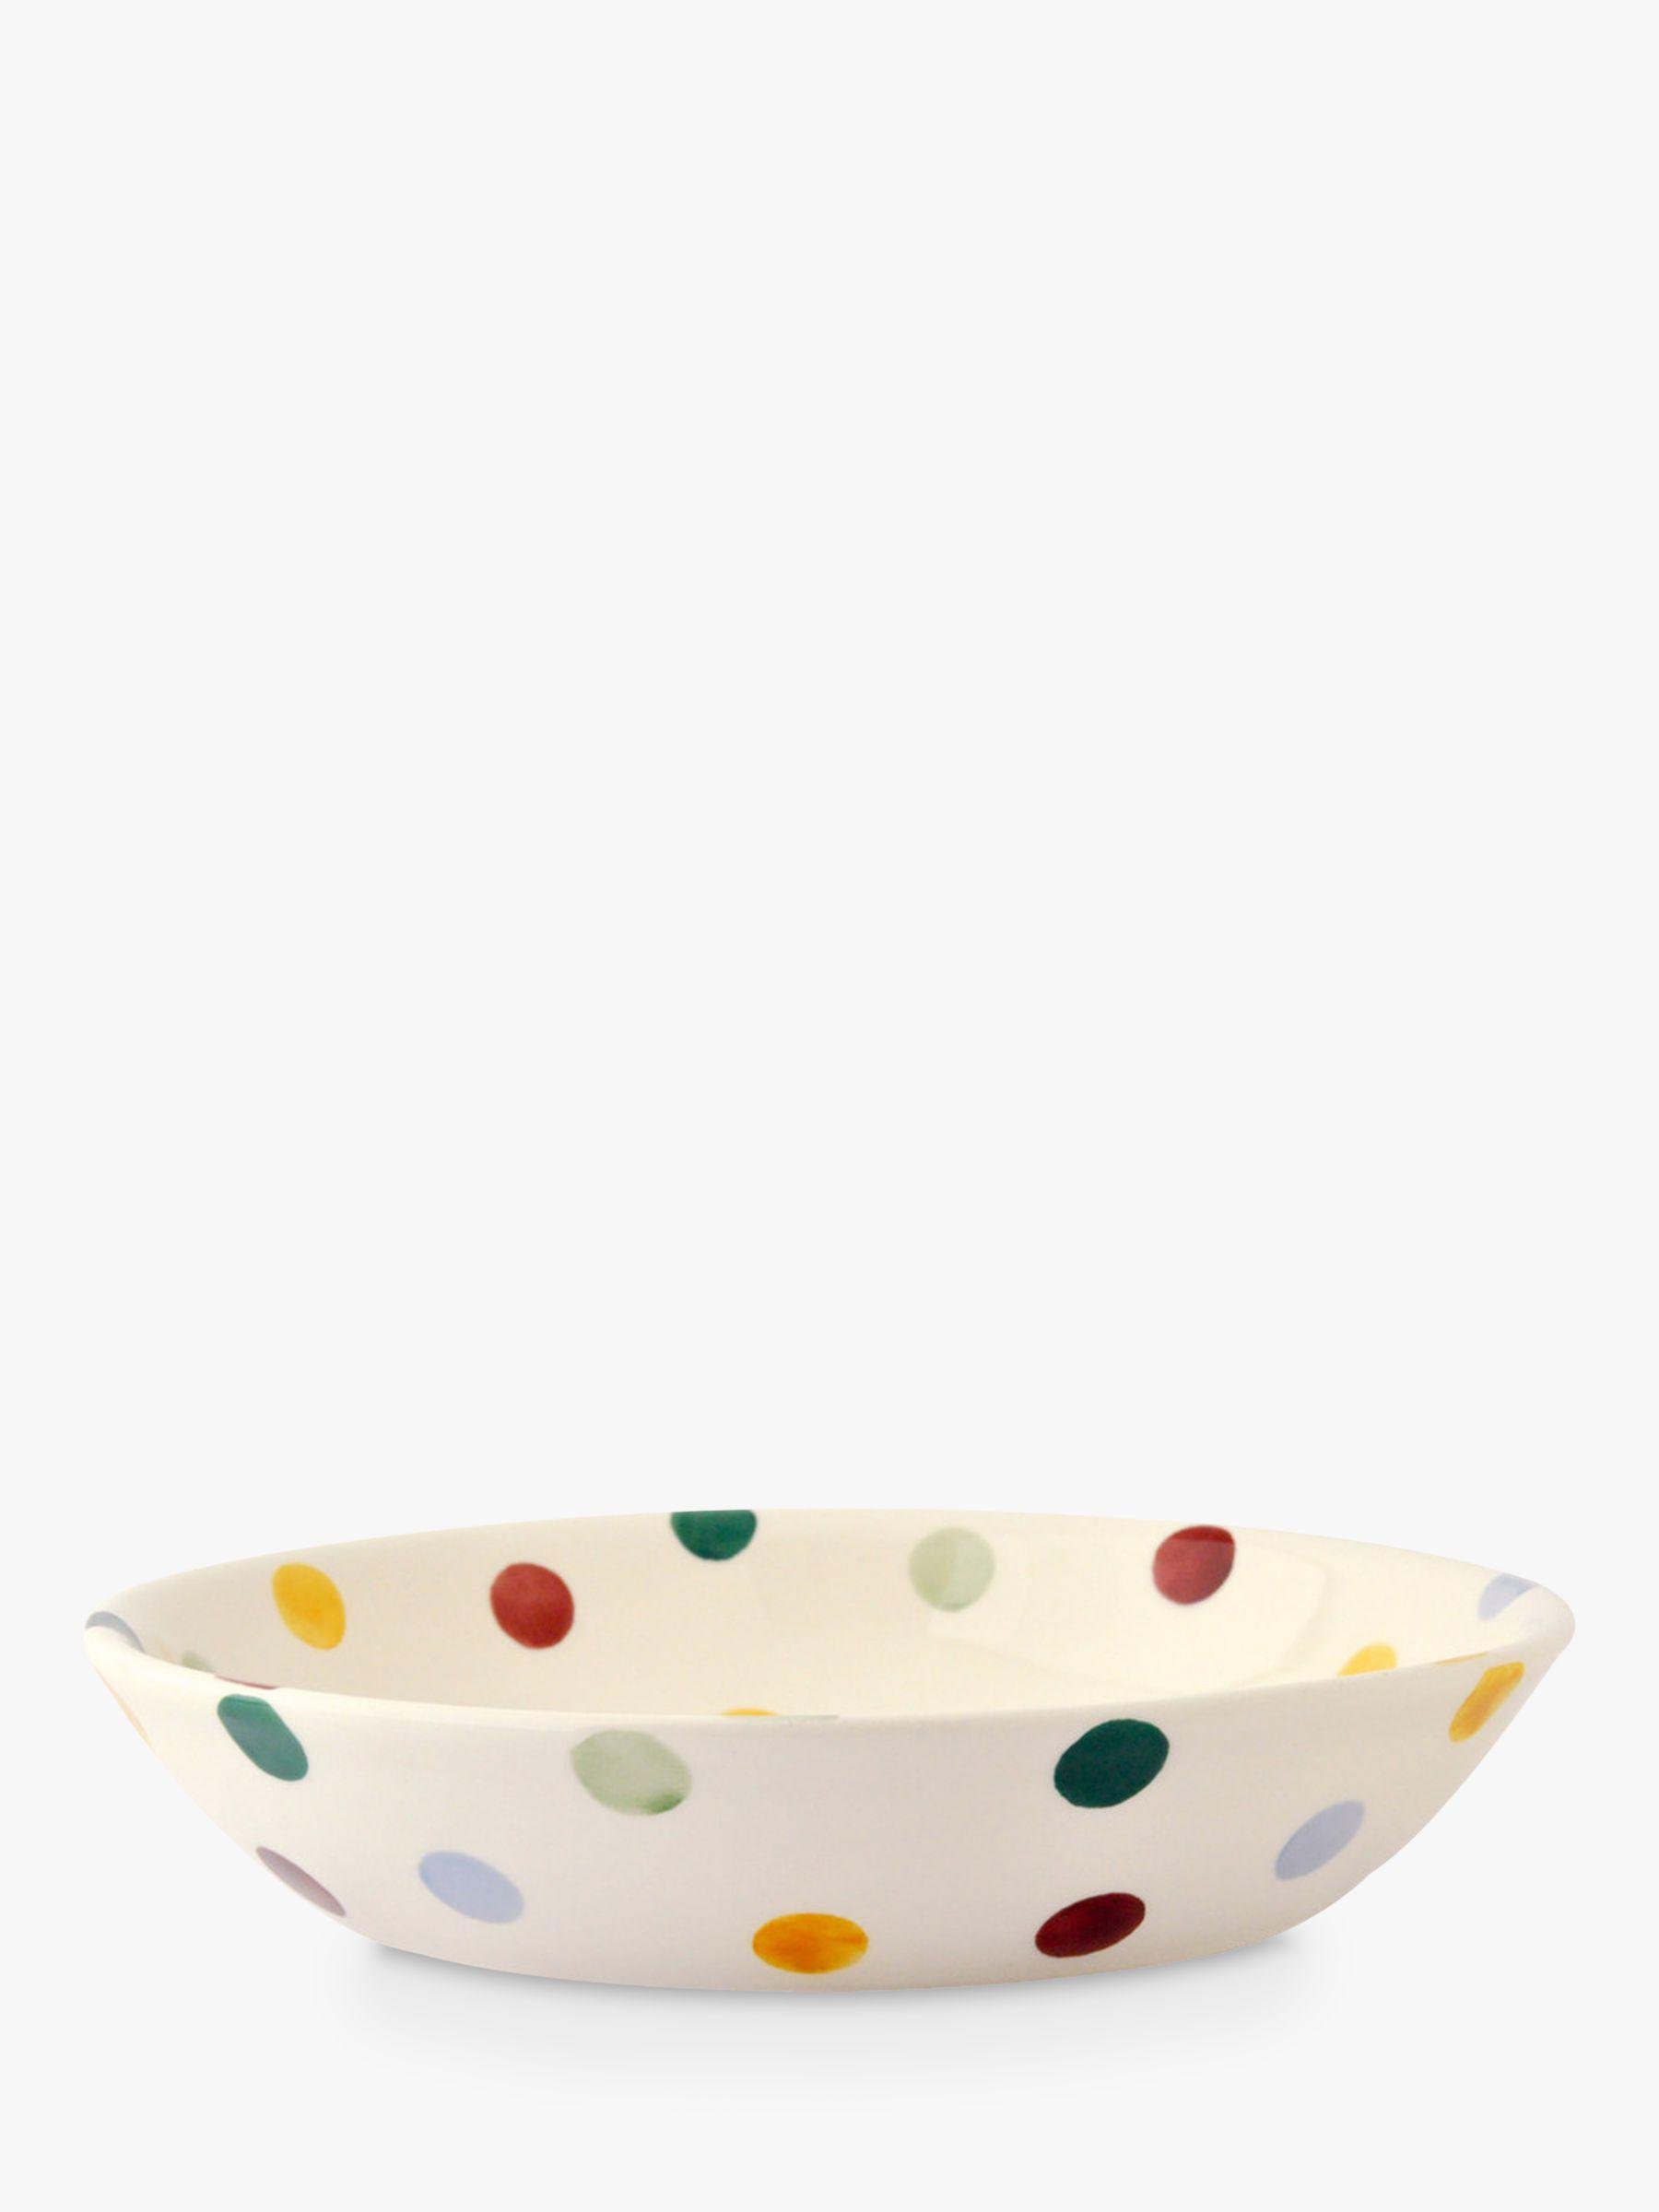 Emma Bridgewater Emma Bridgewater Polka Dot Pasta Bowl, Small